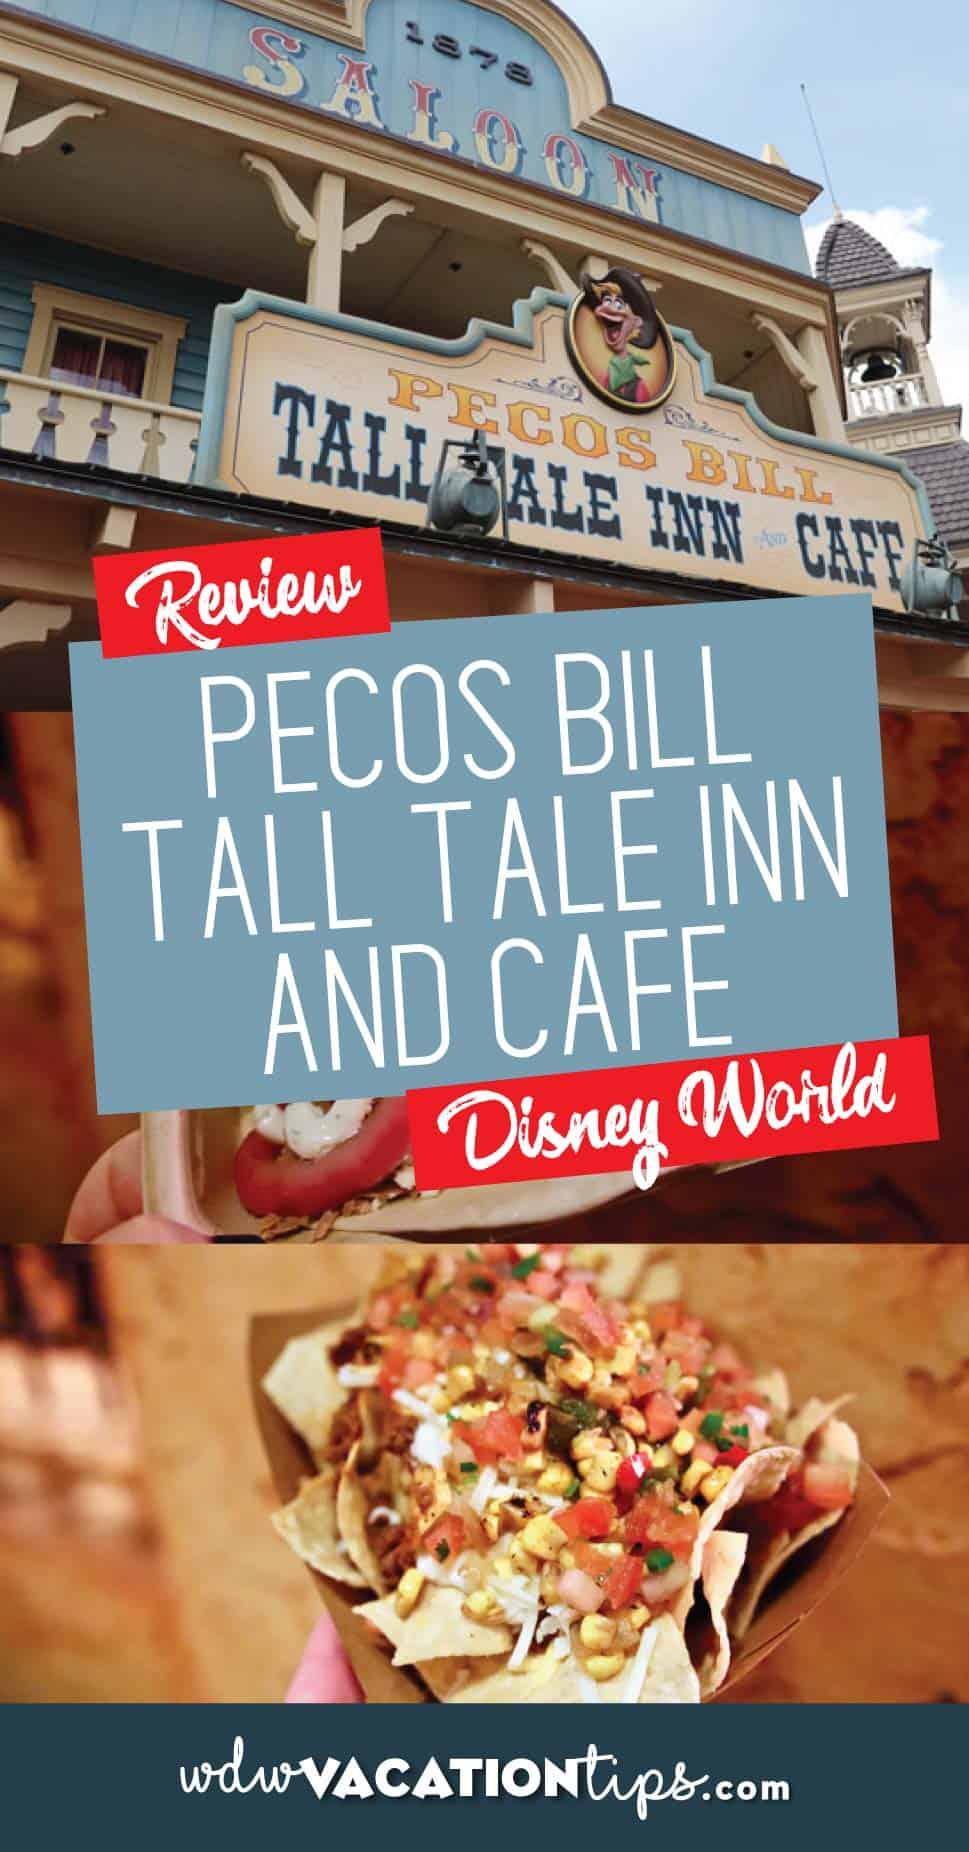 Pecos bill tall tall inn dining review